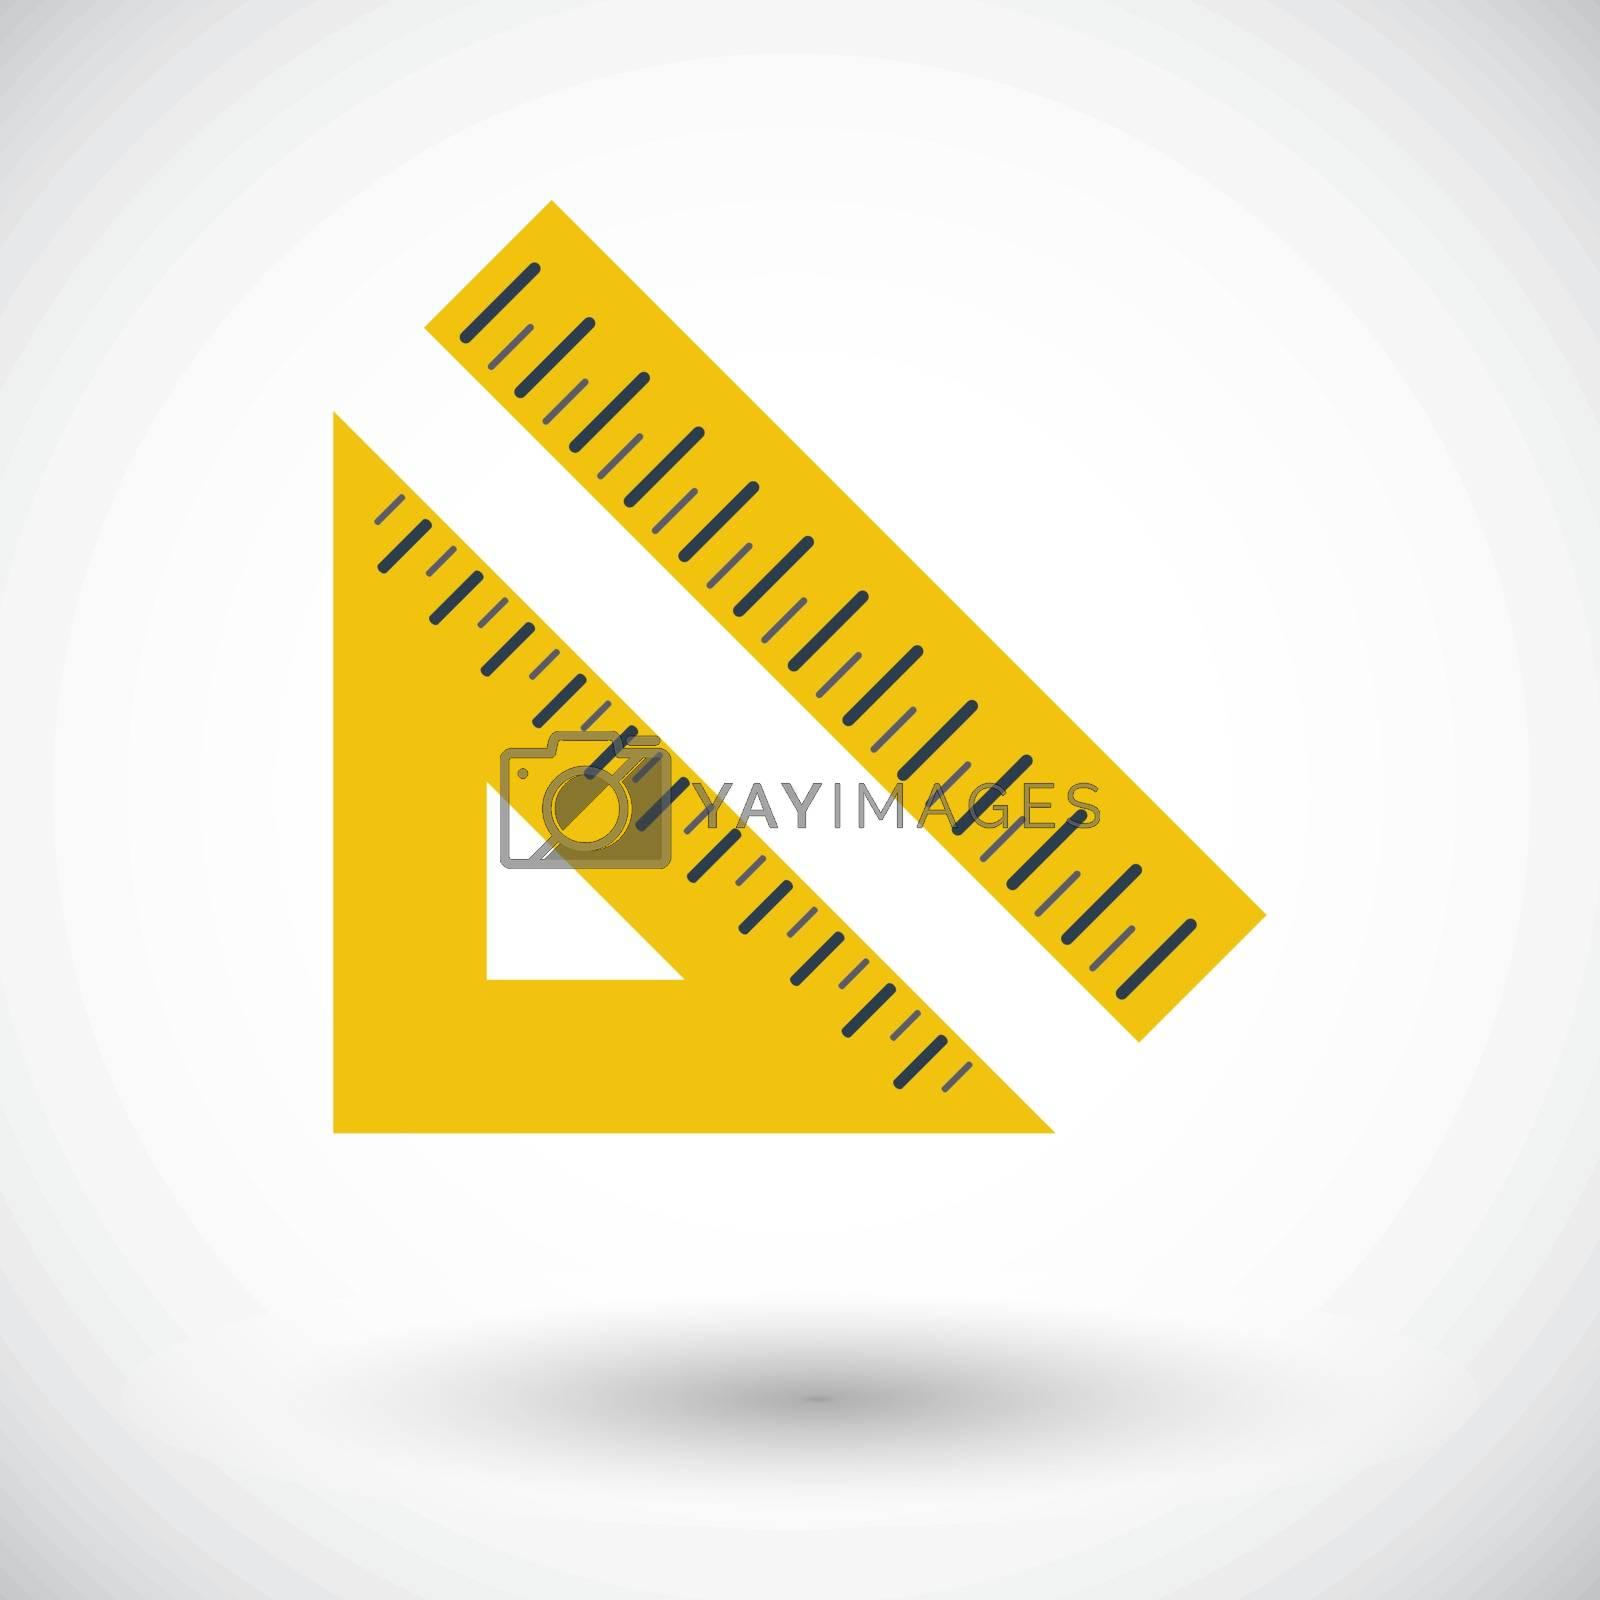 Straightedge. Single flat icon on white background. Vector illustration.